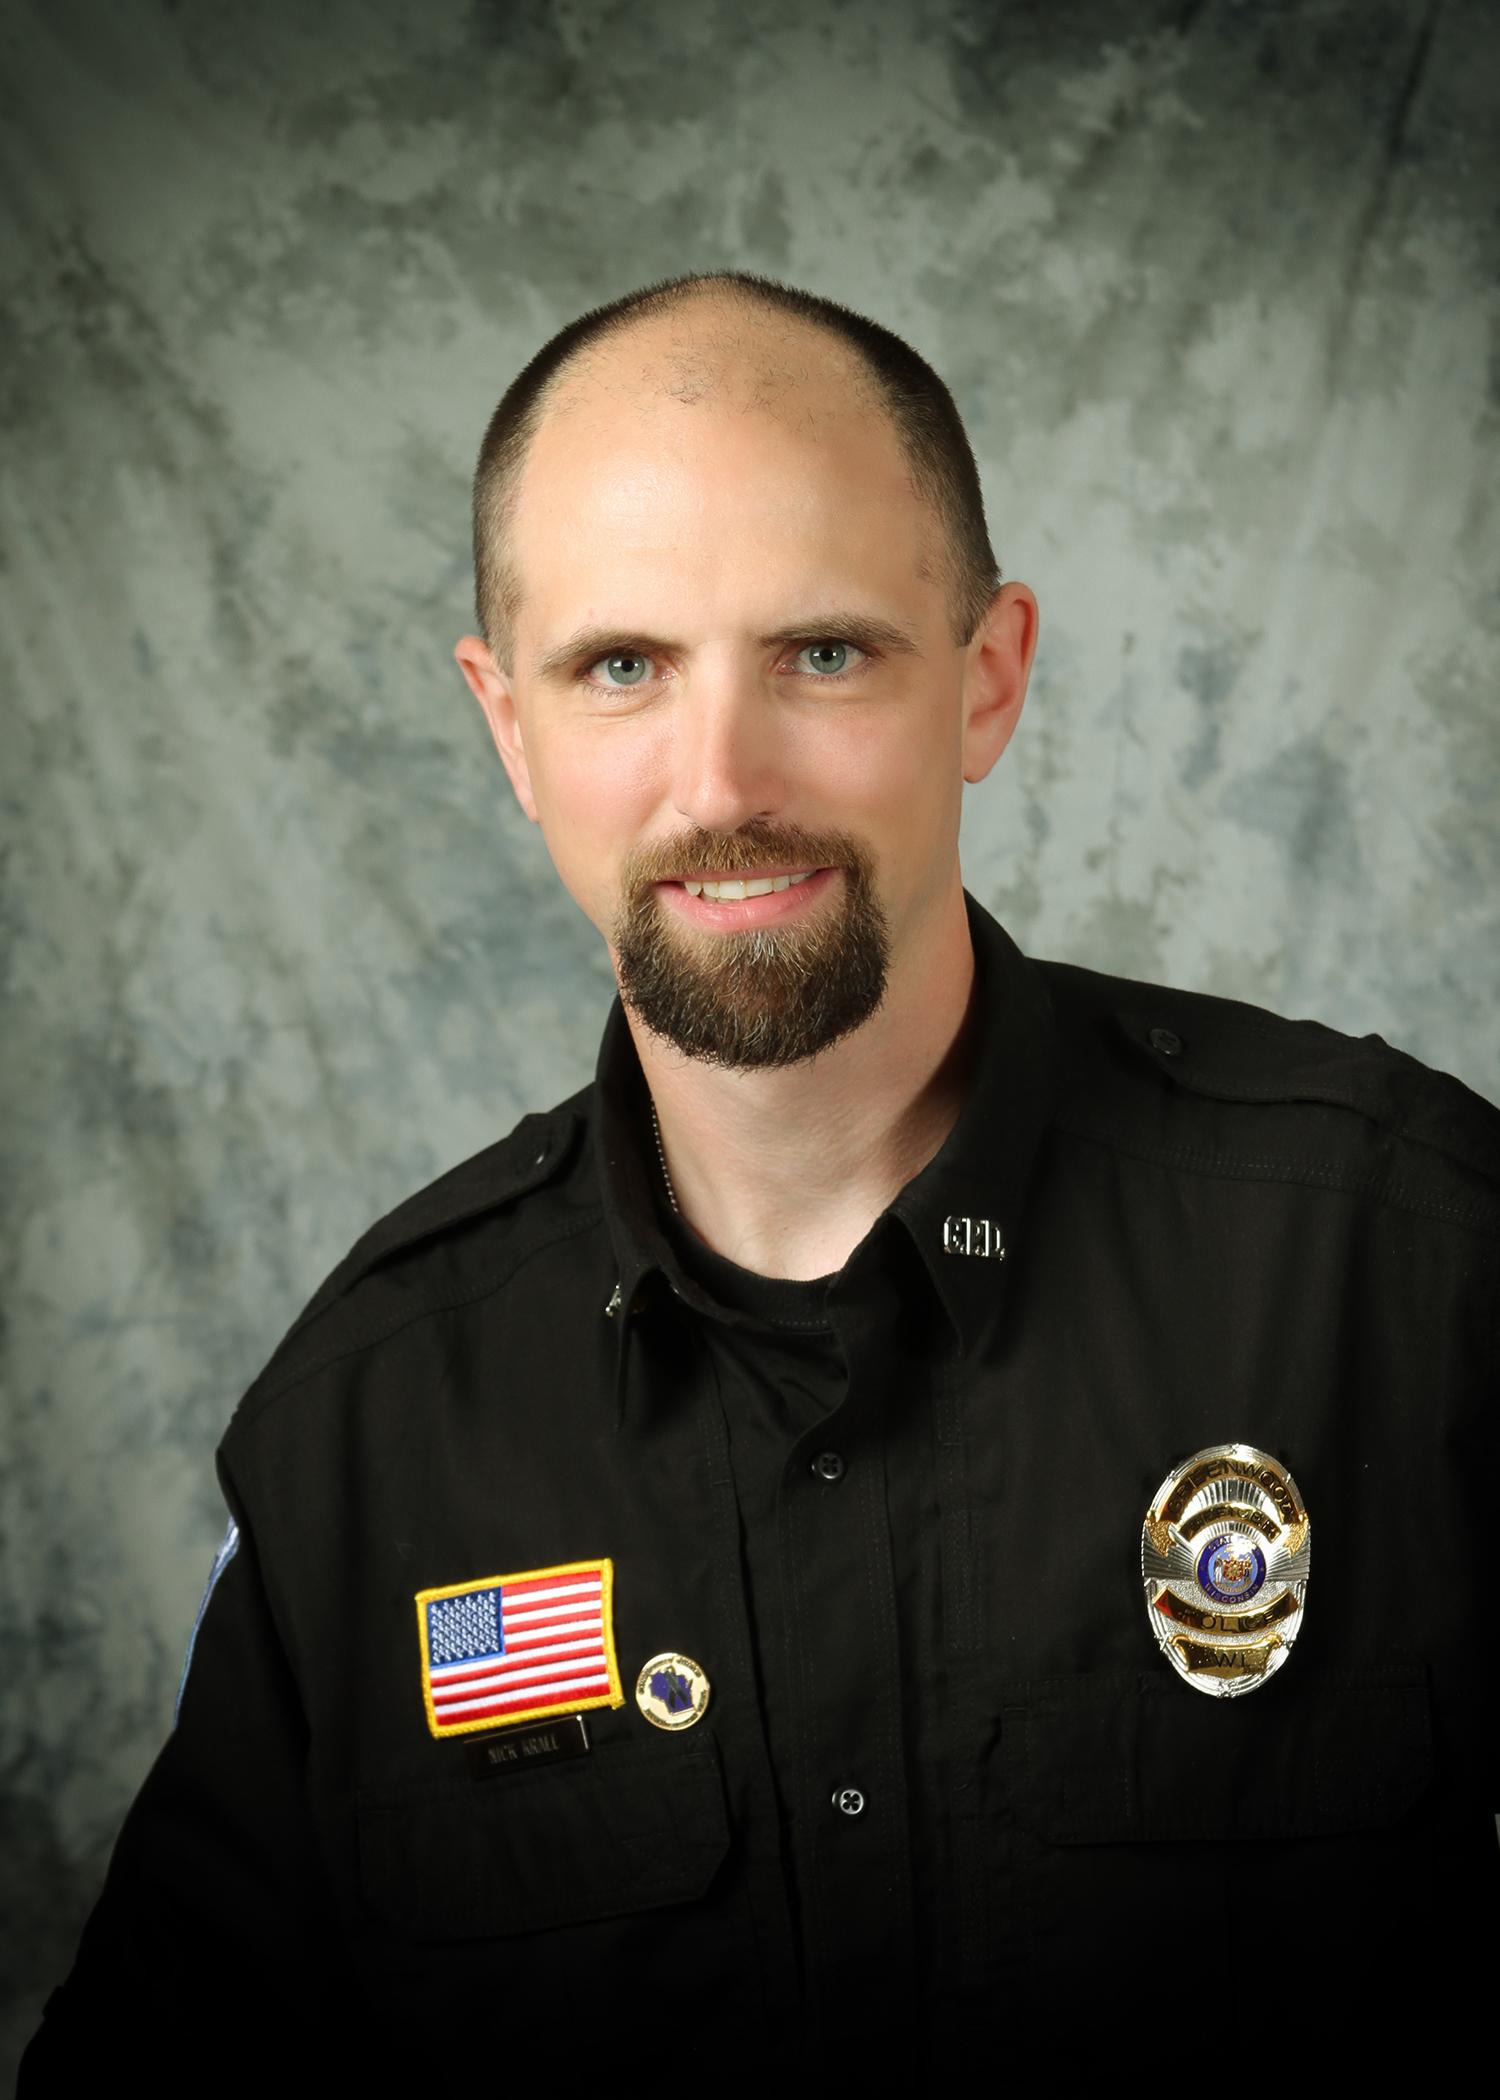 Nicolas Krall - Police Officer   (715)267-6215   nkrall@greenwoodwi.com